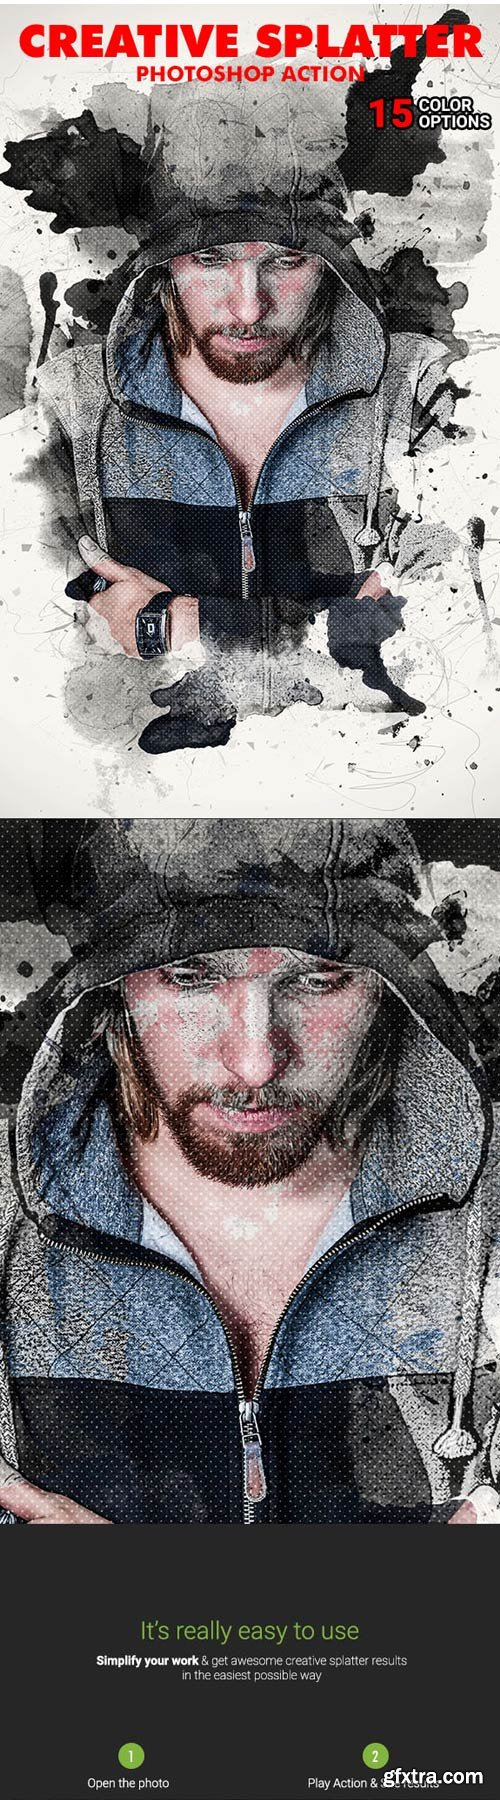 GraphicRiver - Creative Splatter Photoshop Action - 20088983